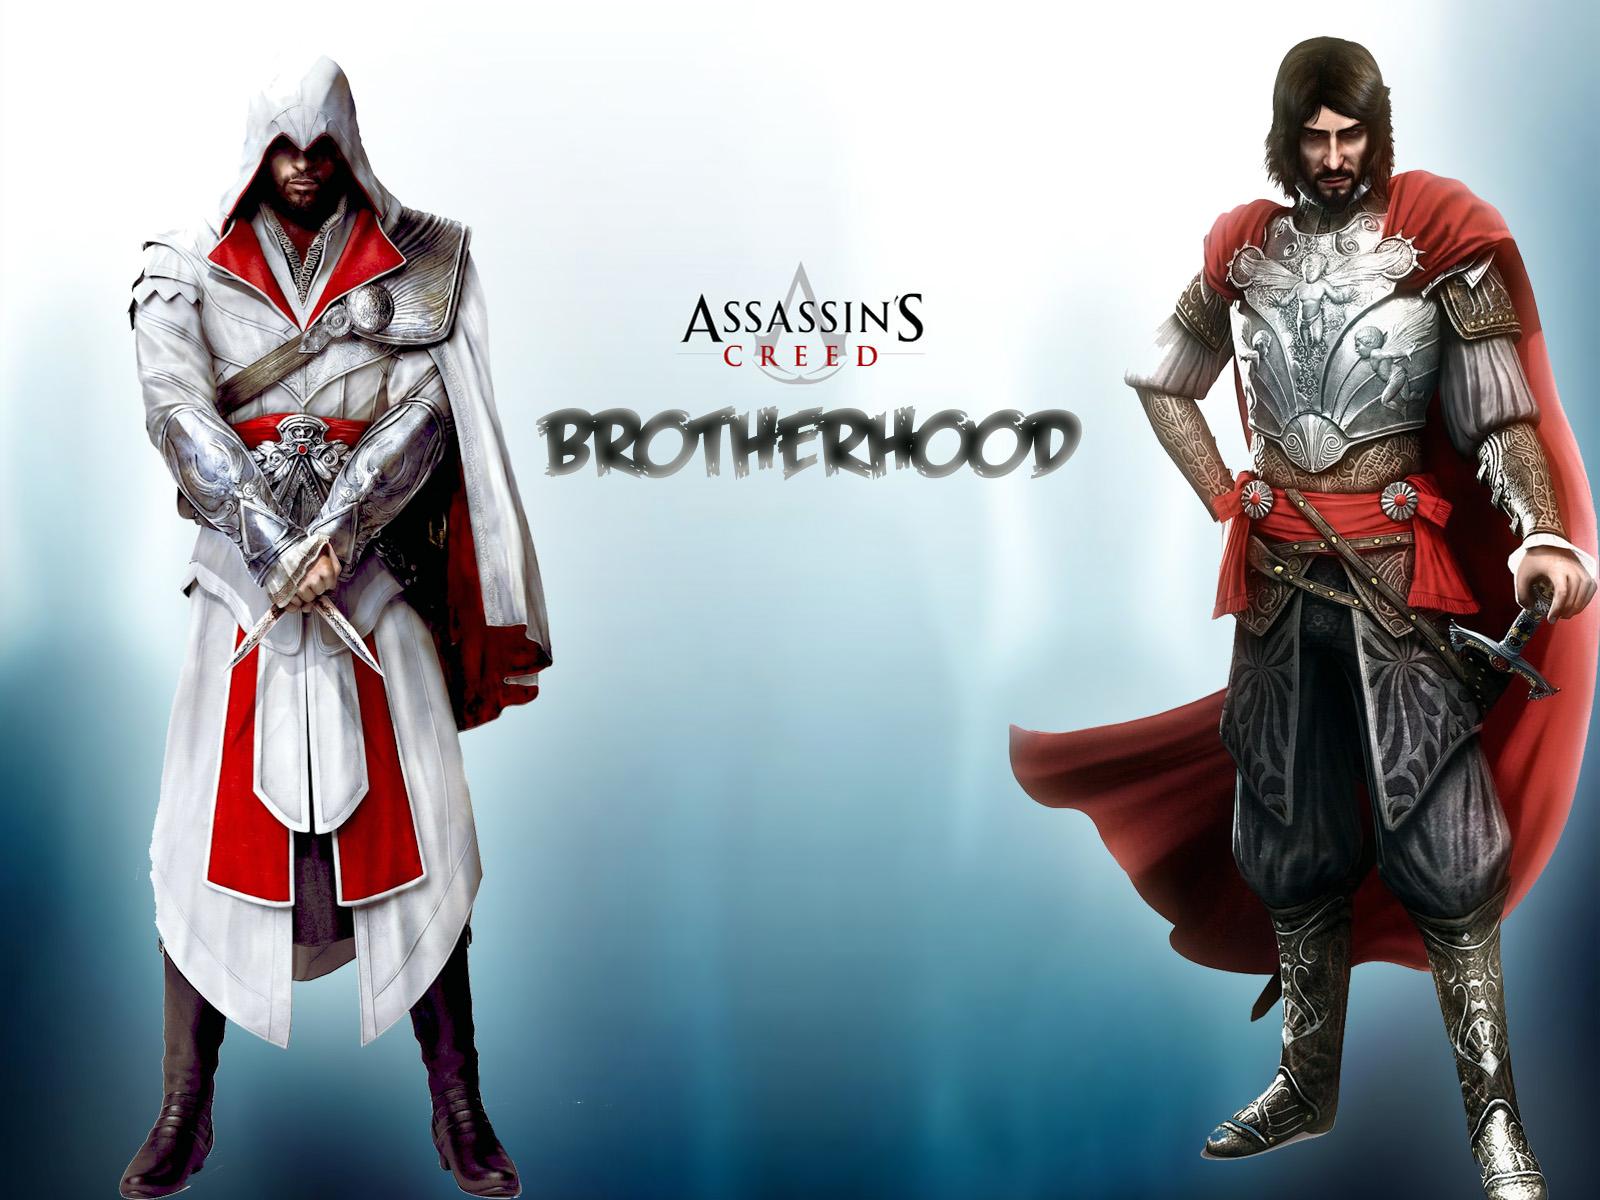 Videogioco assassin 39 s creed brotherhood sfondo for Assassin s creed sfondi